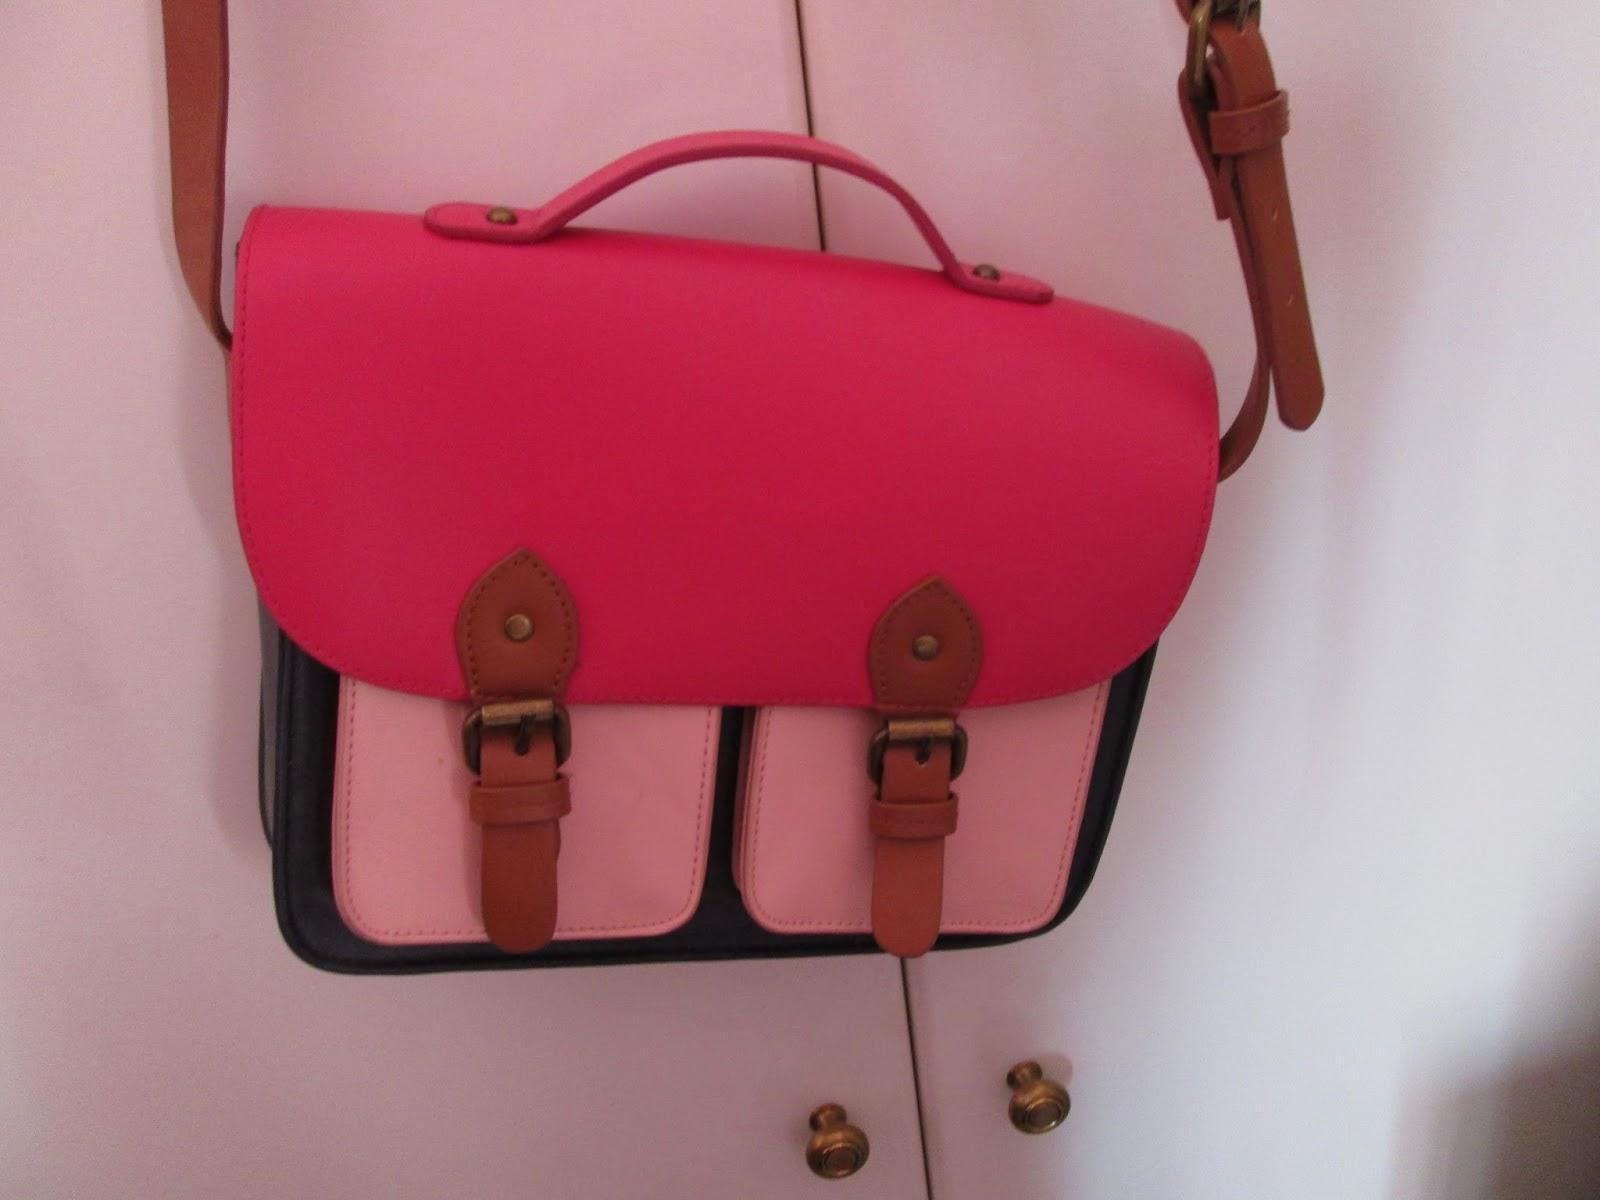 4) Tσάντα satchel Berhska Έχει φορεθεί μόνο 1-2 φορές Τιμή 12 ευρώ. 5)  Ρομαντική δαντελωτή φουστίτσα Η Μ σε ... c1dd219bb75